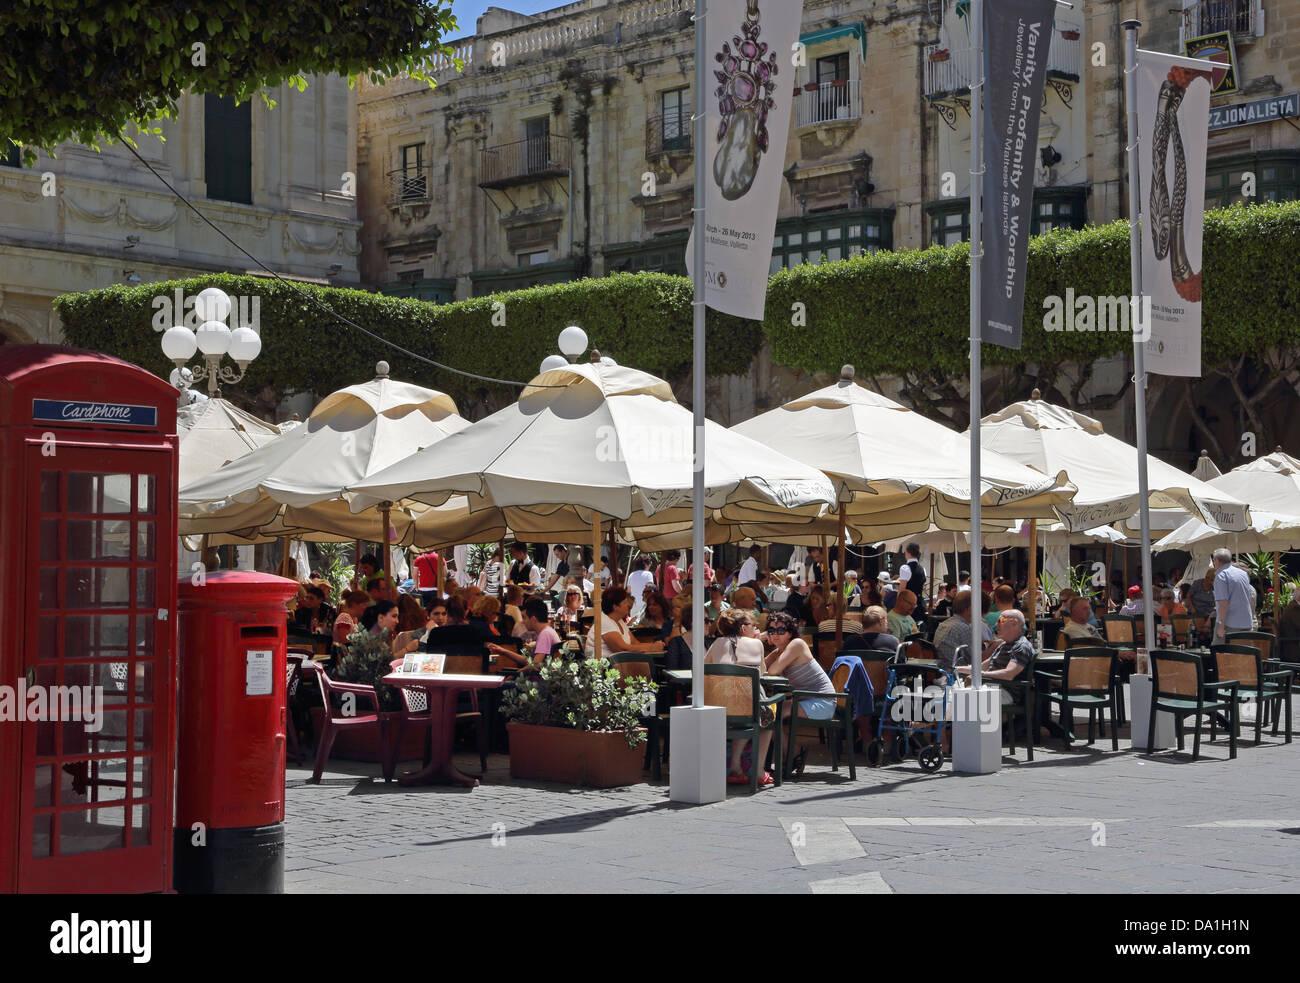 CAFE CORDINA,ST.JOHN'S SQUARE,VALLETTA,MALTA - Stock Image